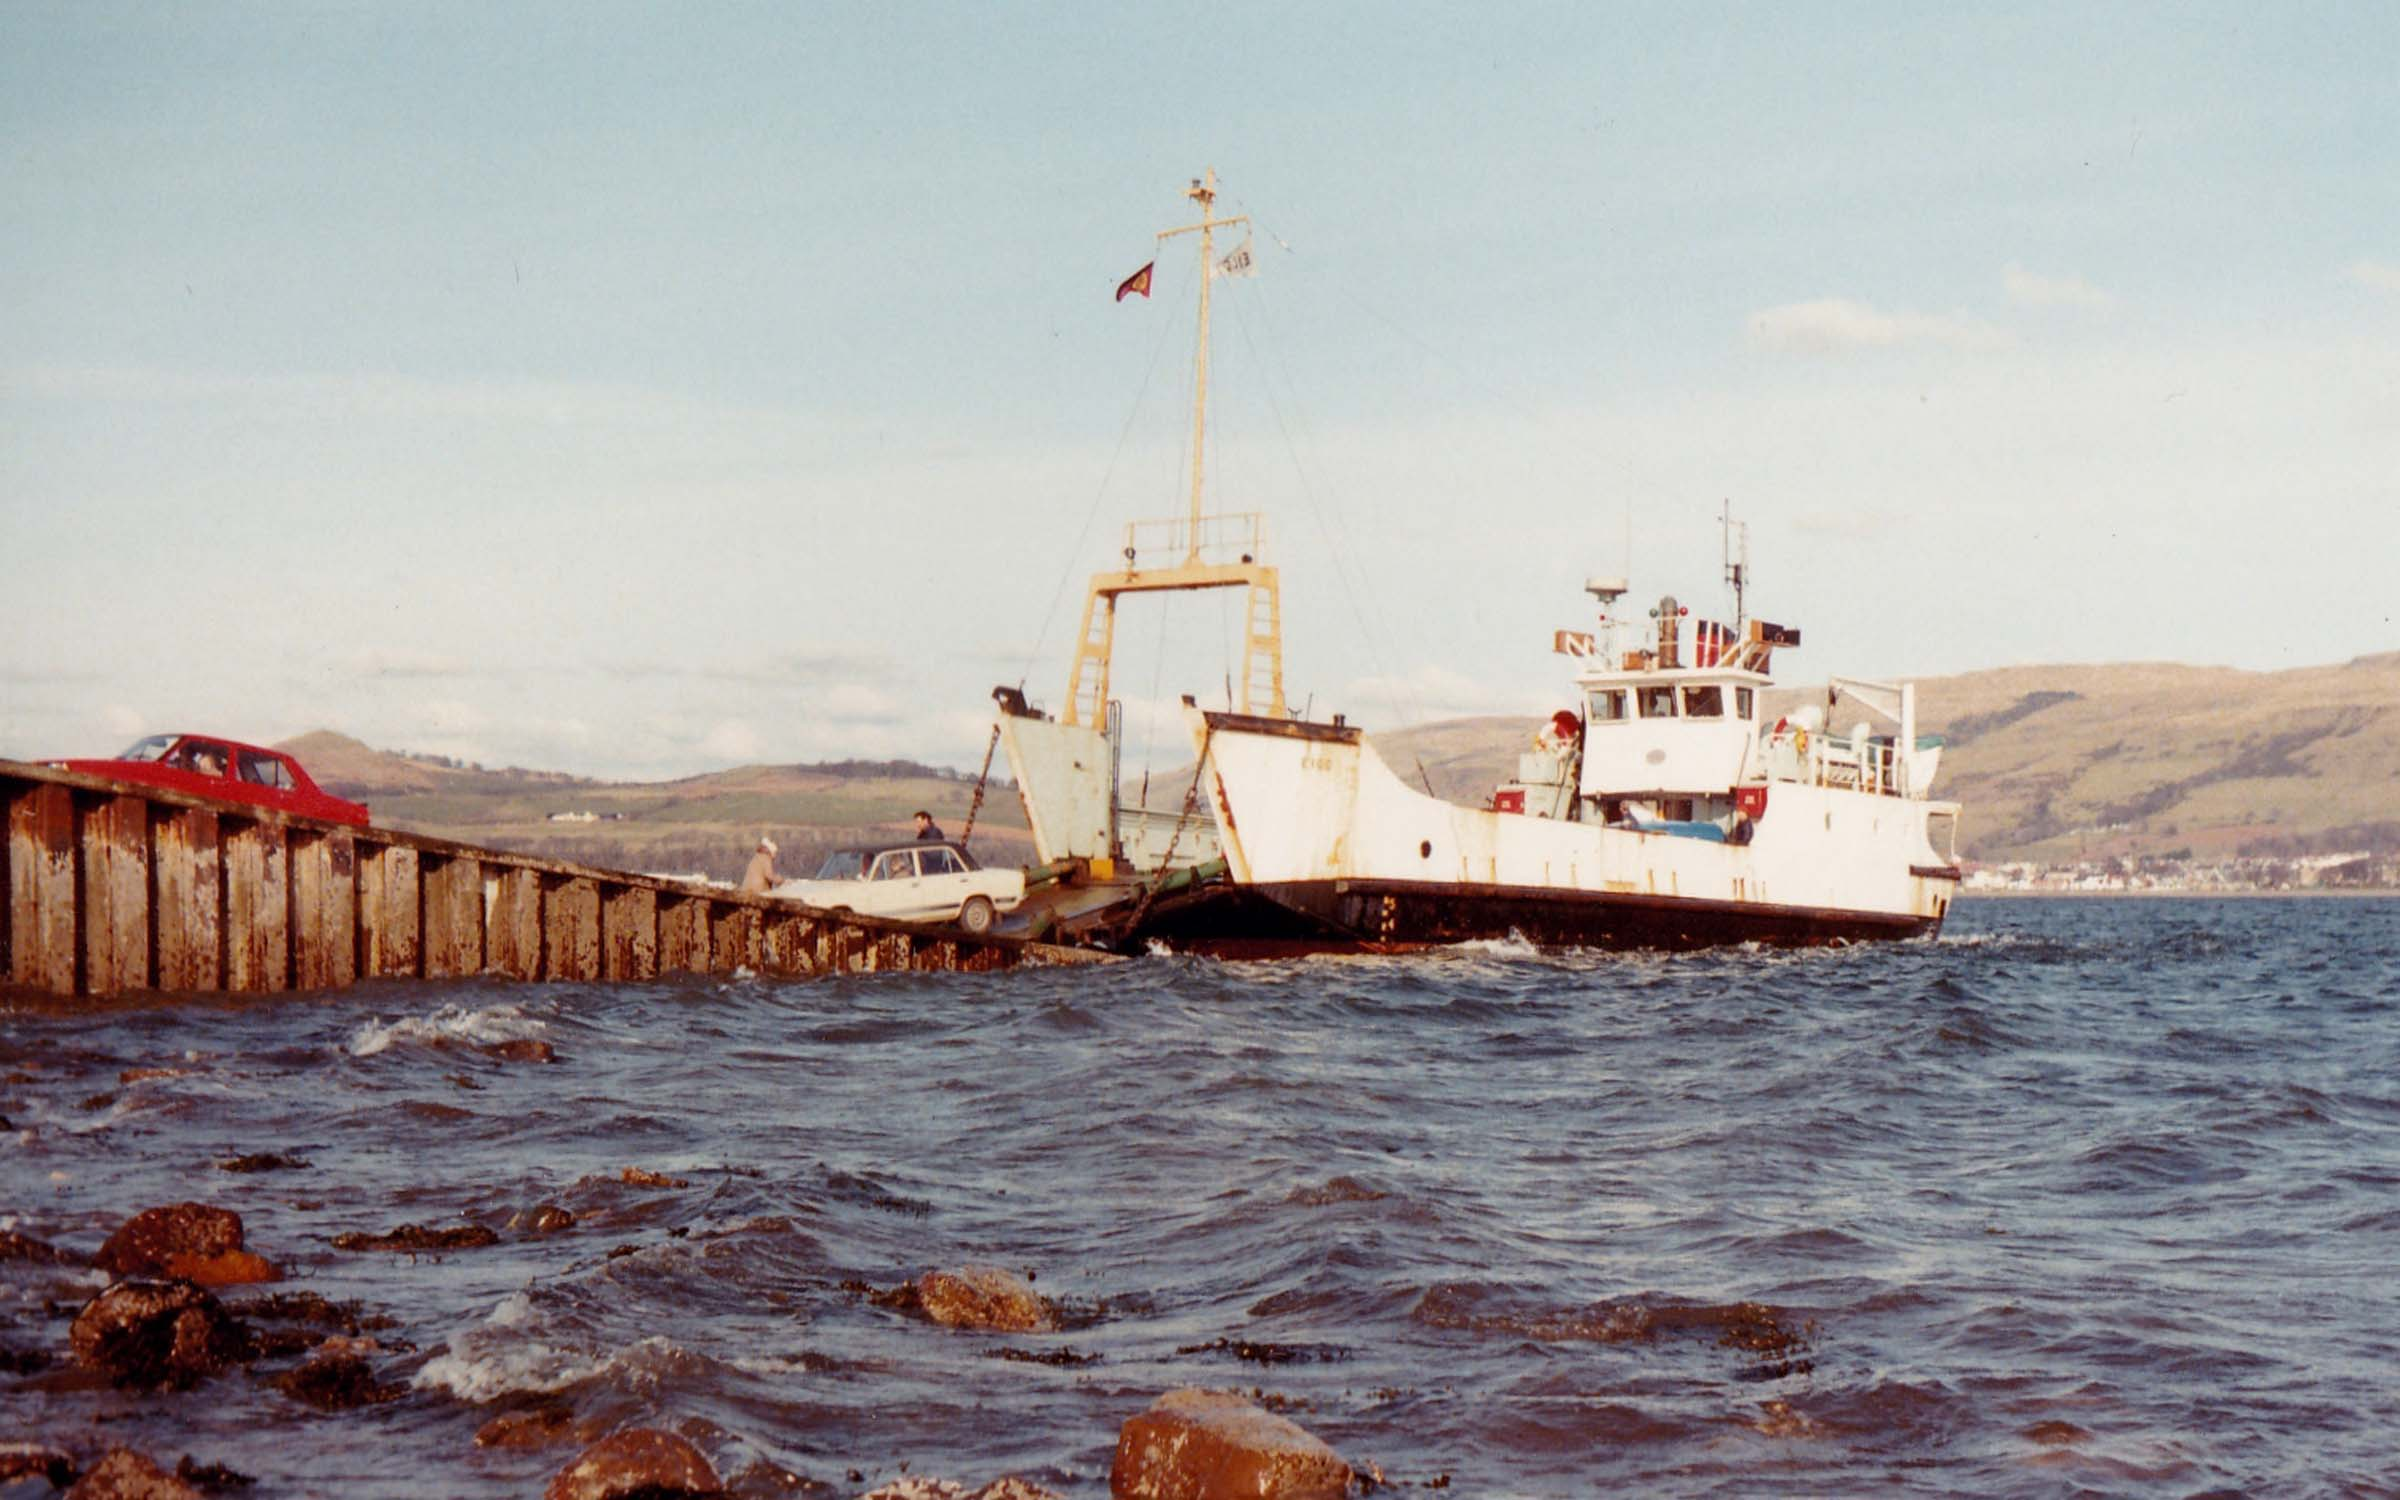 Eigg at Cumbrae Slip (Jim Aikman Smith)